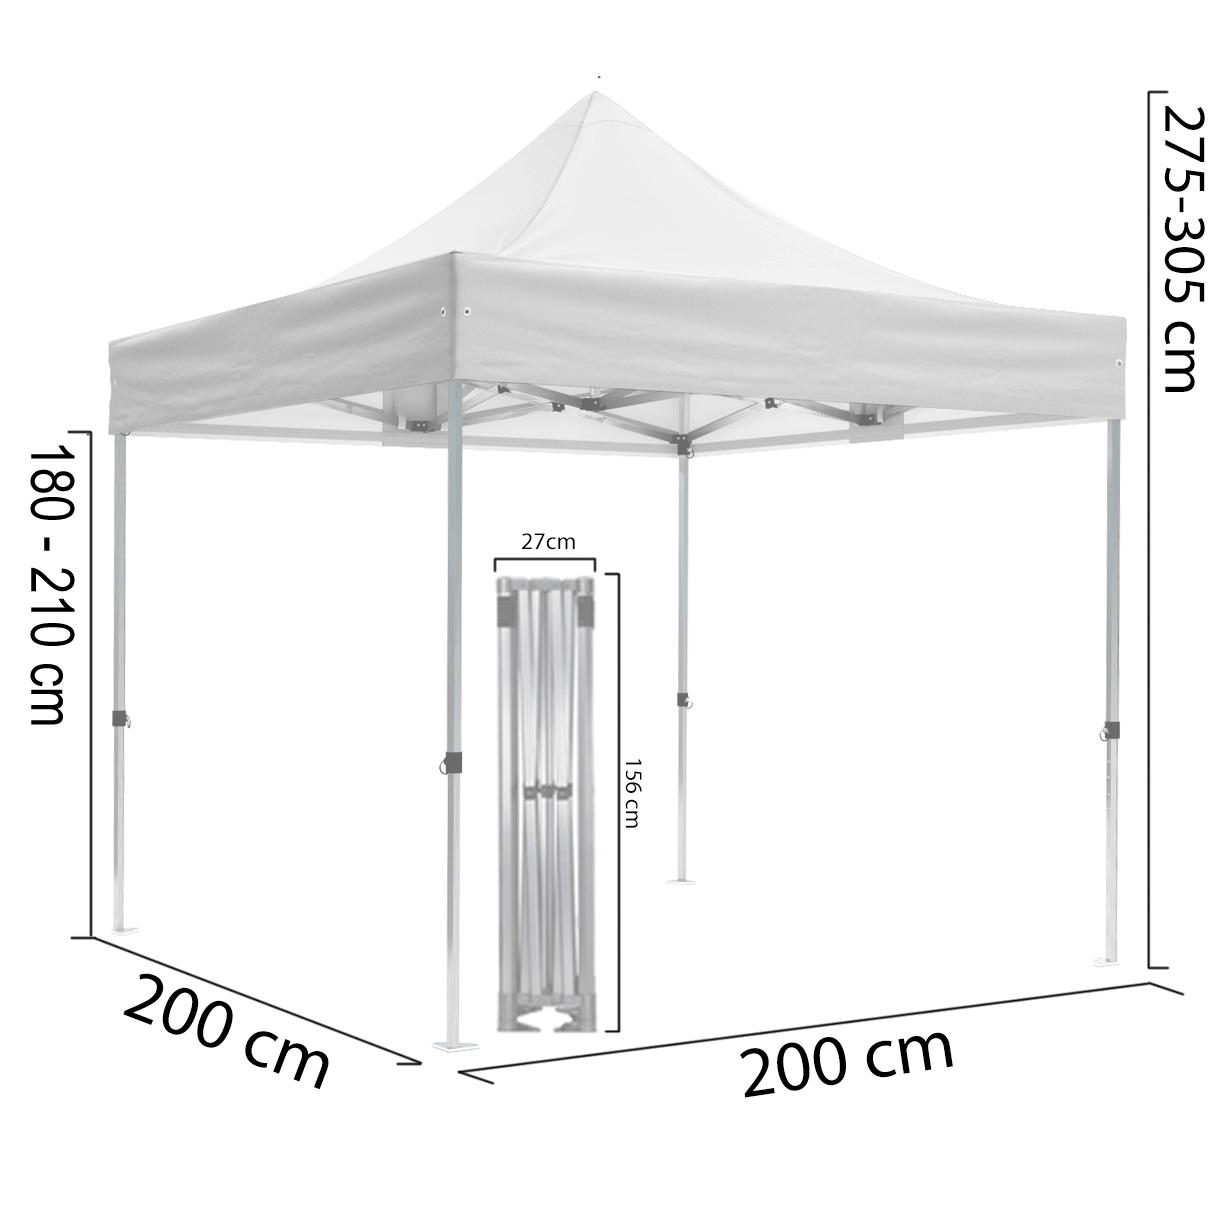 Duratent-Faltzelt-2x2m